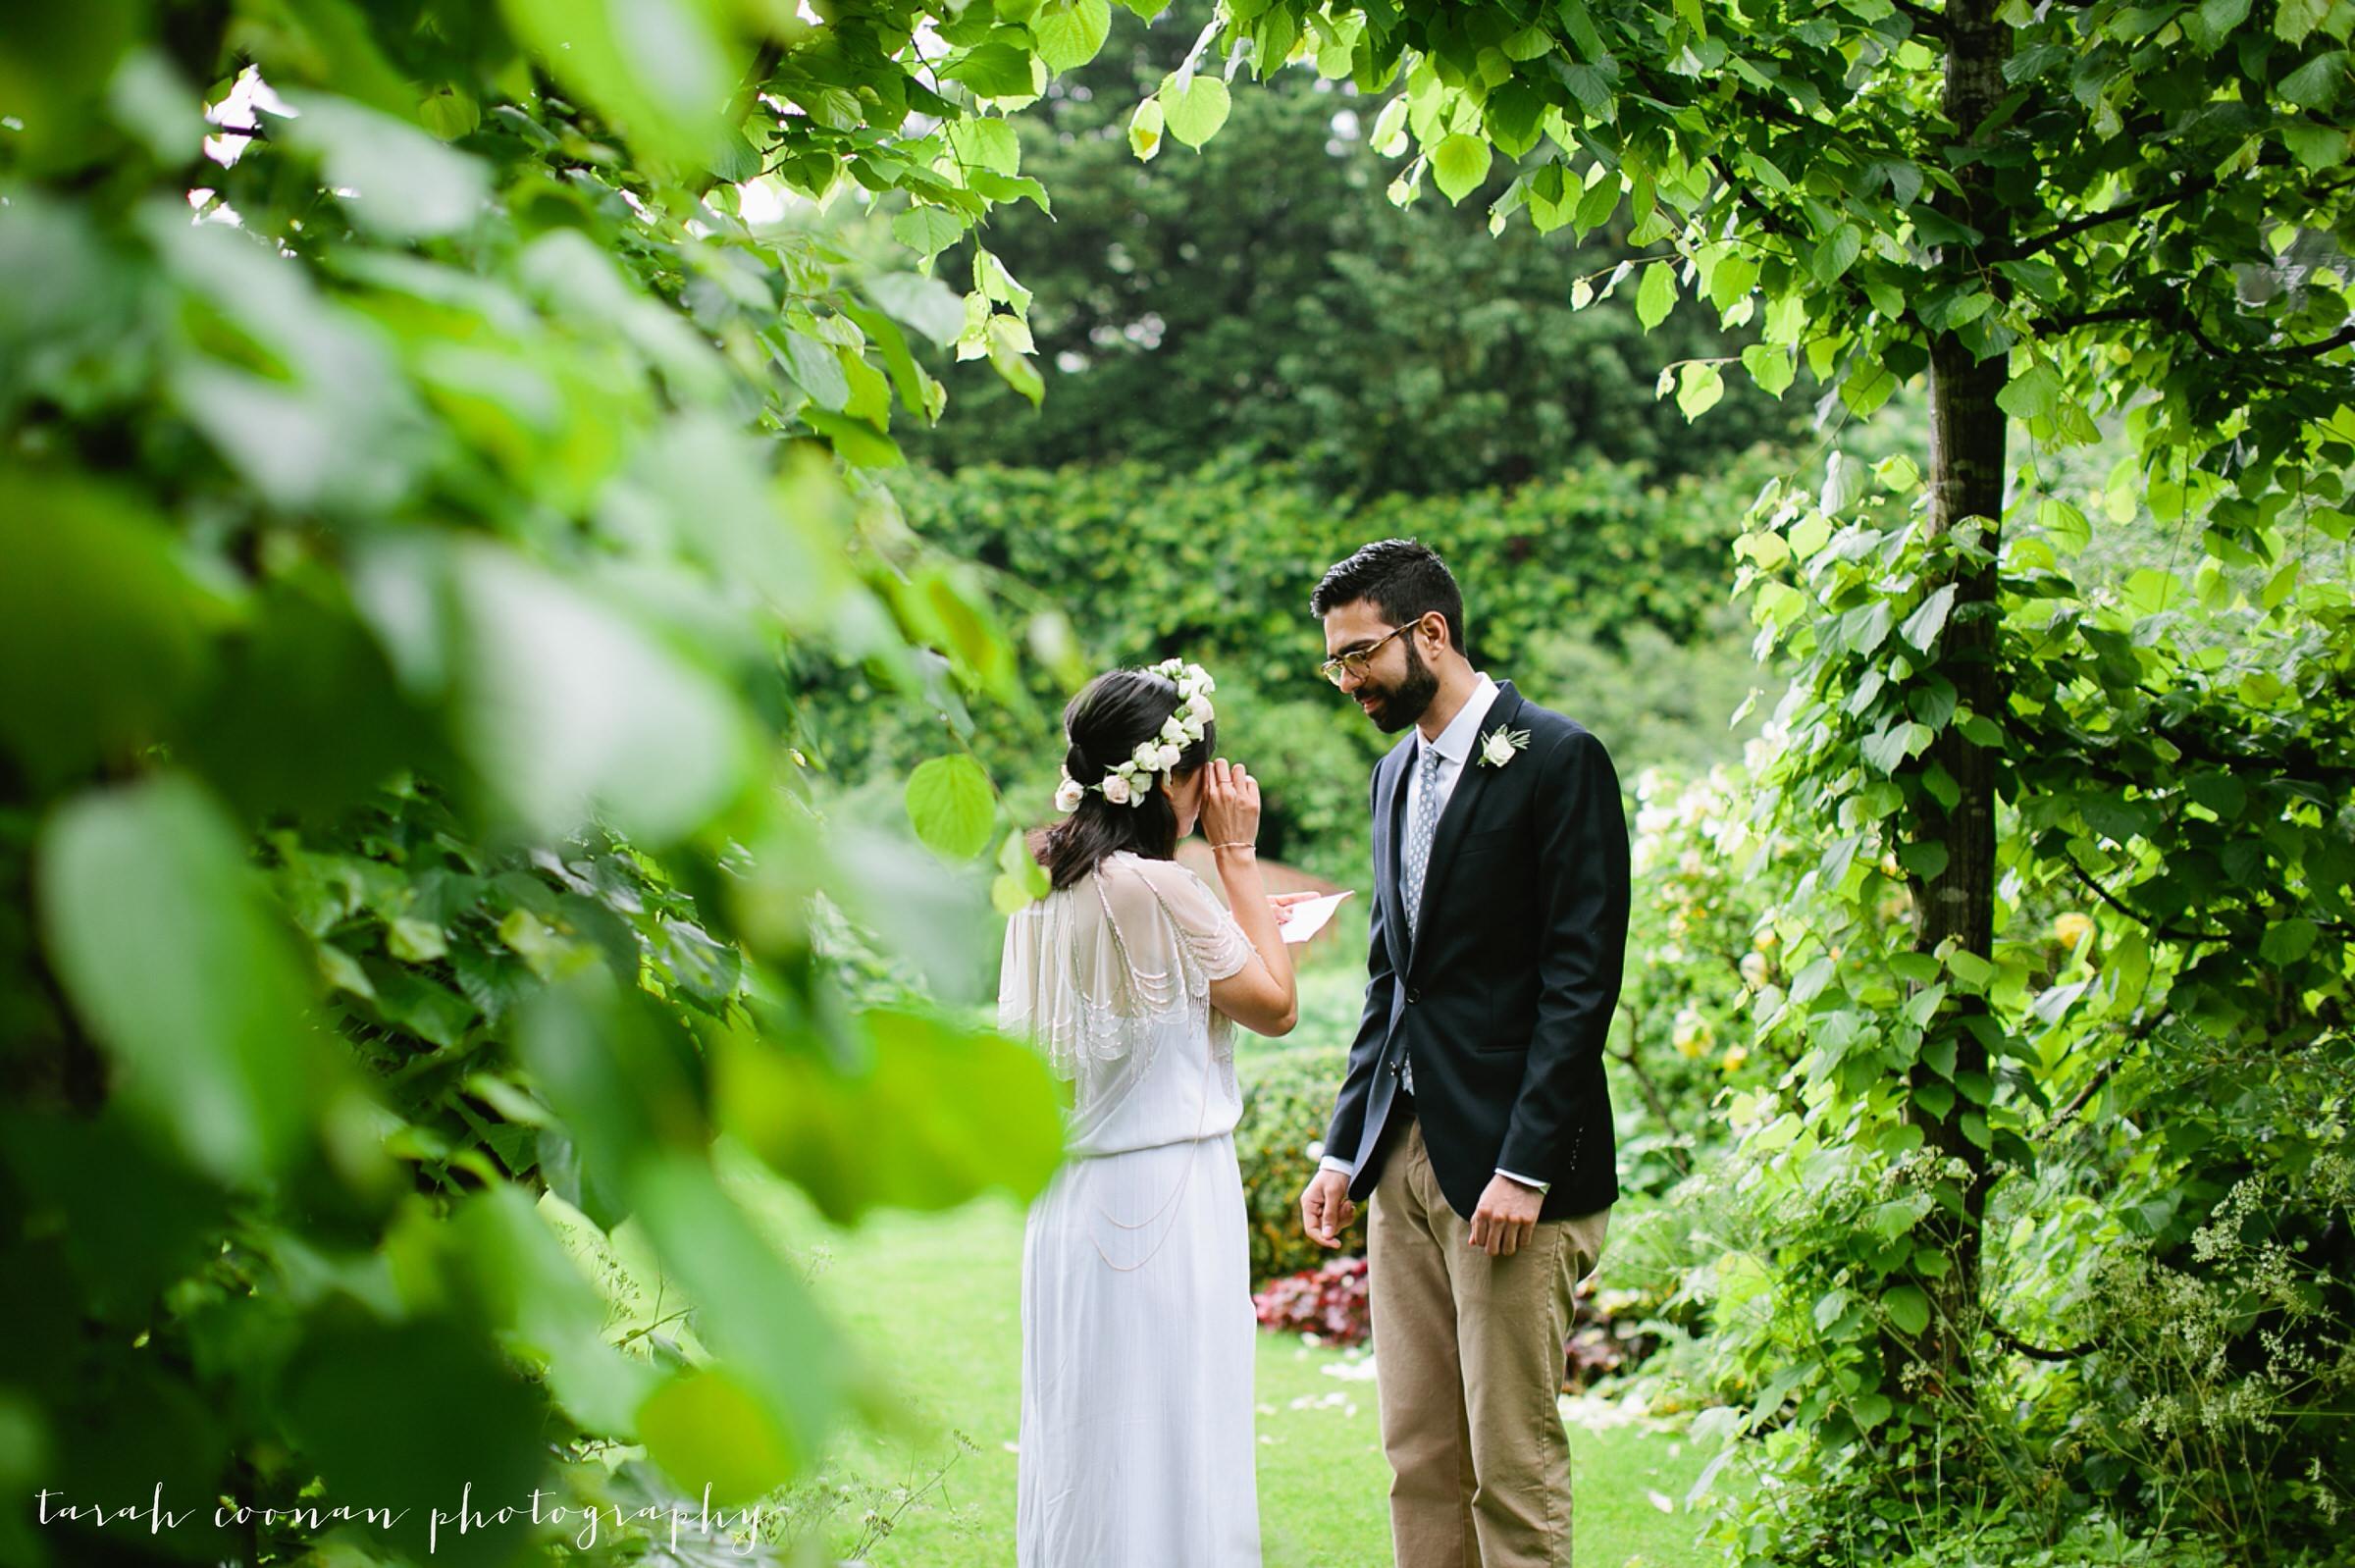 tearful wedding ceremony